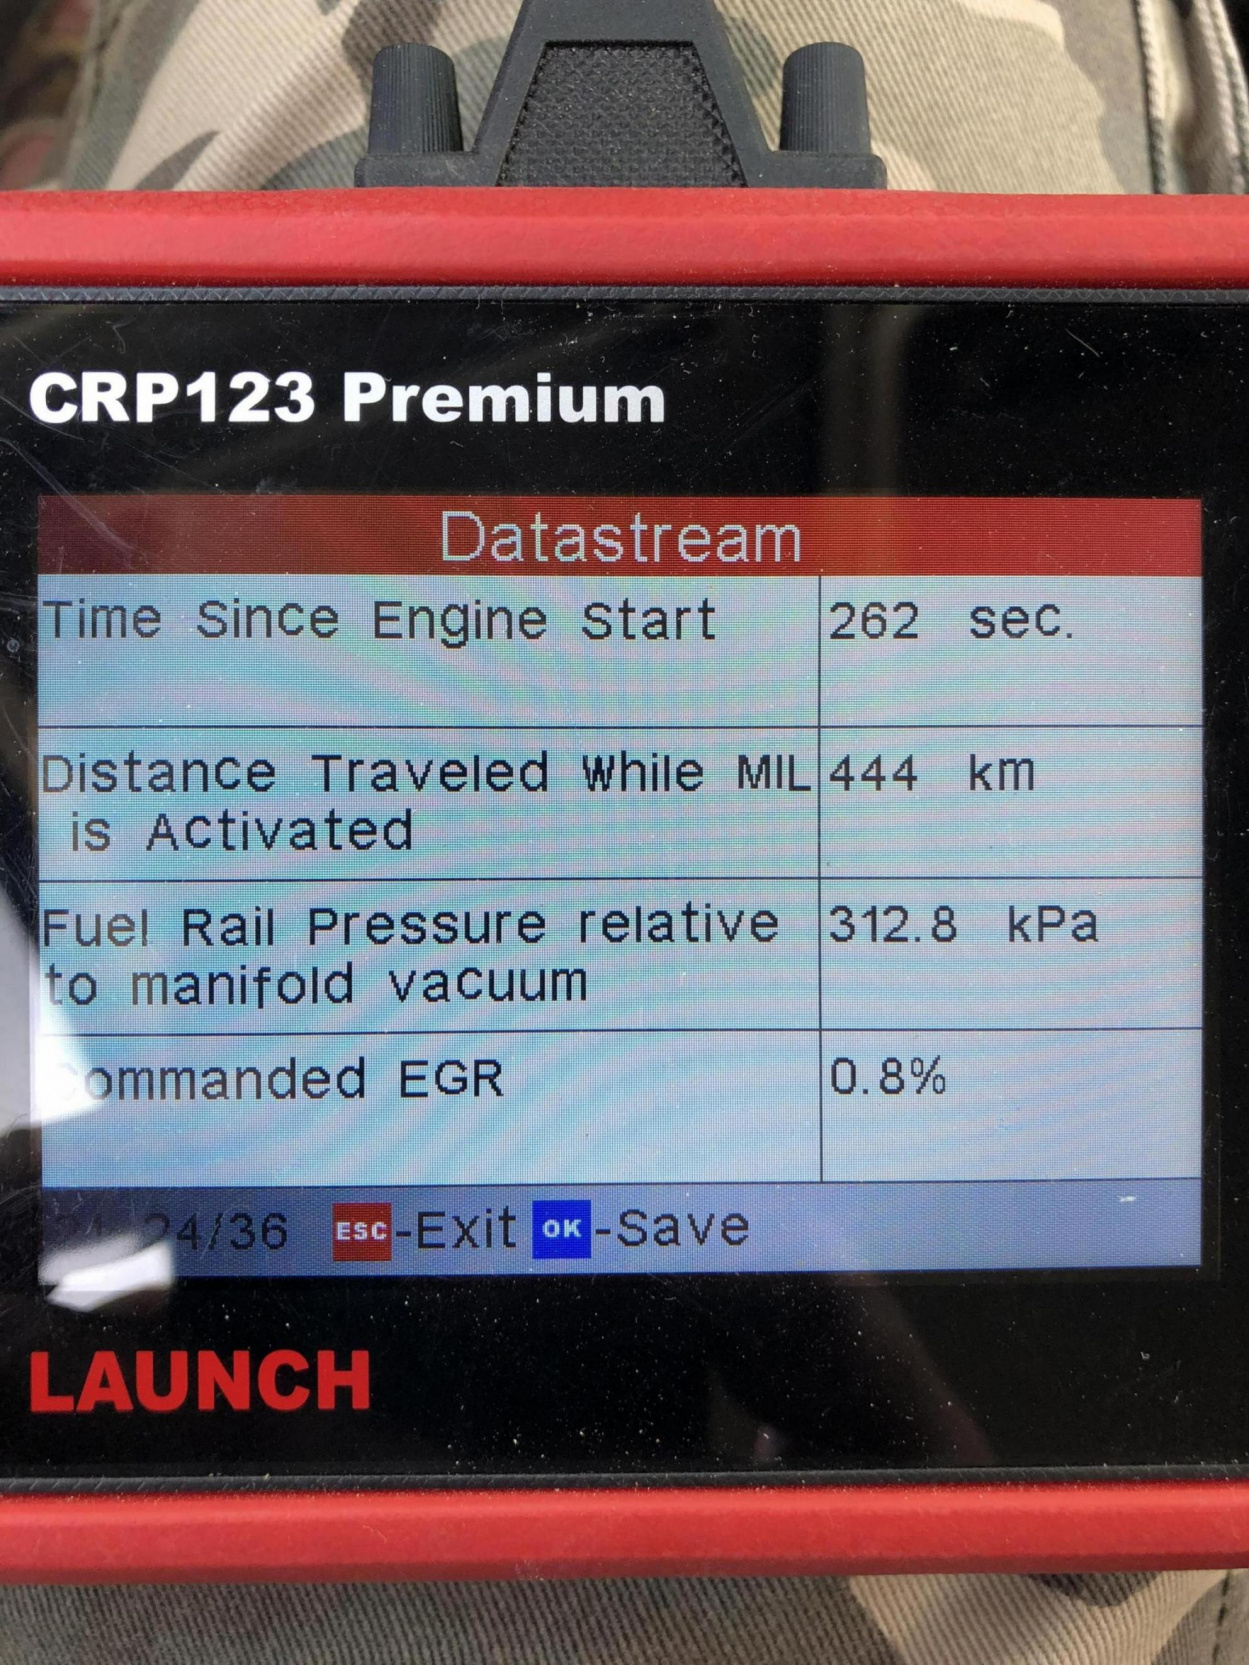 Code P0171 System too Lean. (not the PCV hose)-697a6b1a-a64a-4762-92f7-ce965e009ba5_1561676631704.jpg